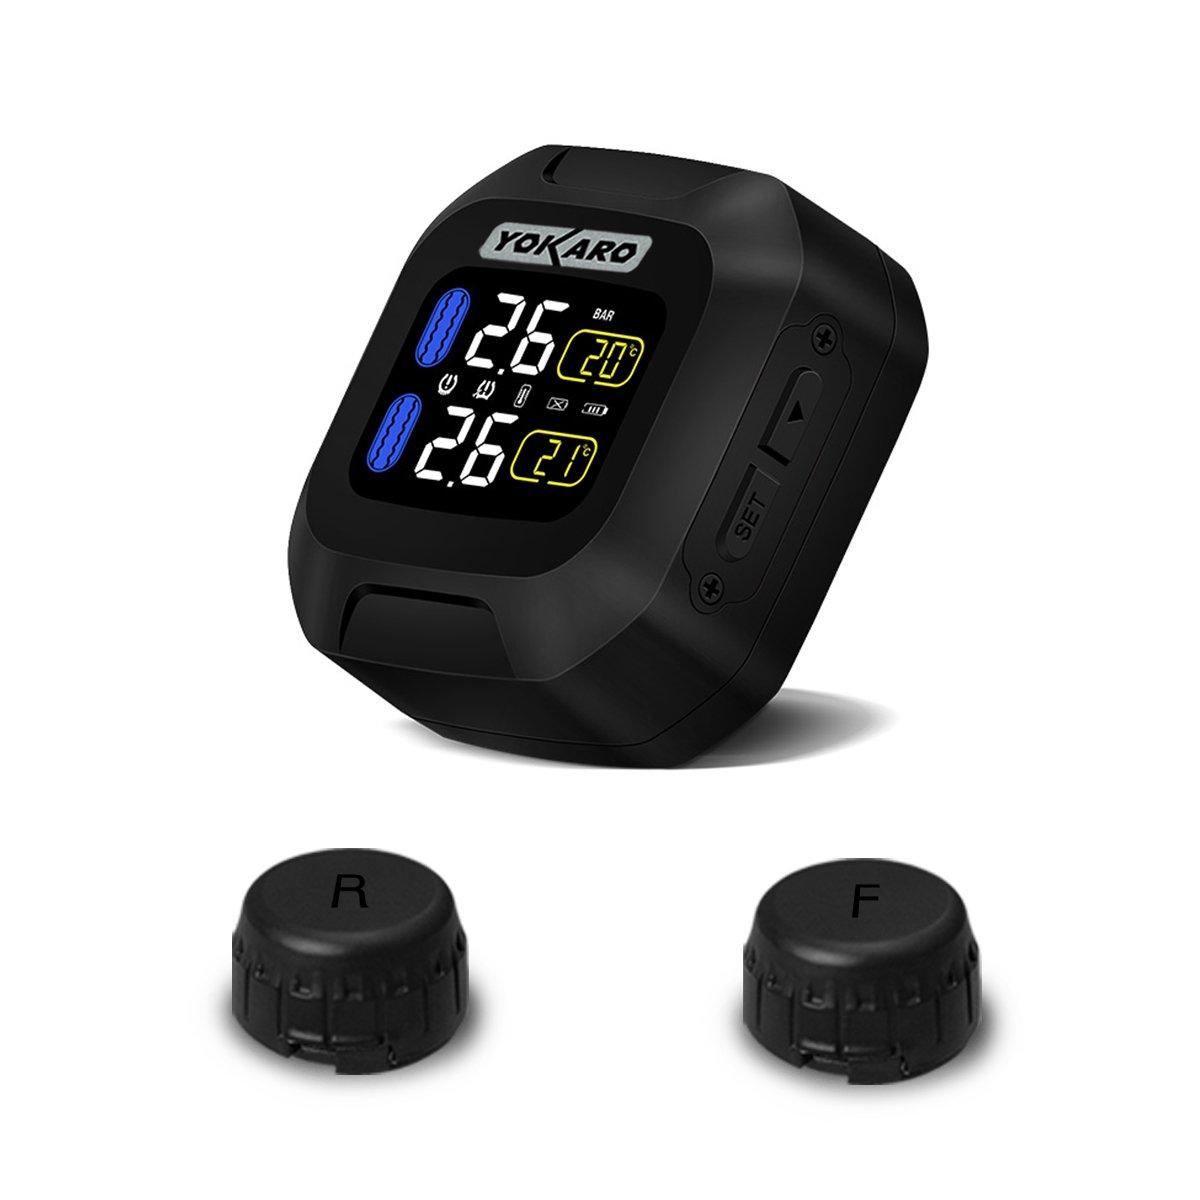 FULLELE Wireless Waterproof Tire Pressure Monitoring System (TPMS) for Motorcycle, 2 External Sensors